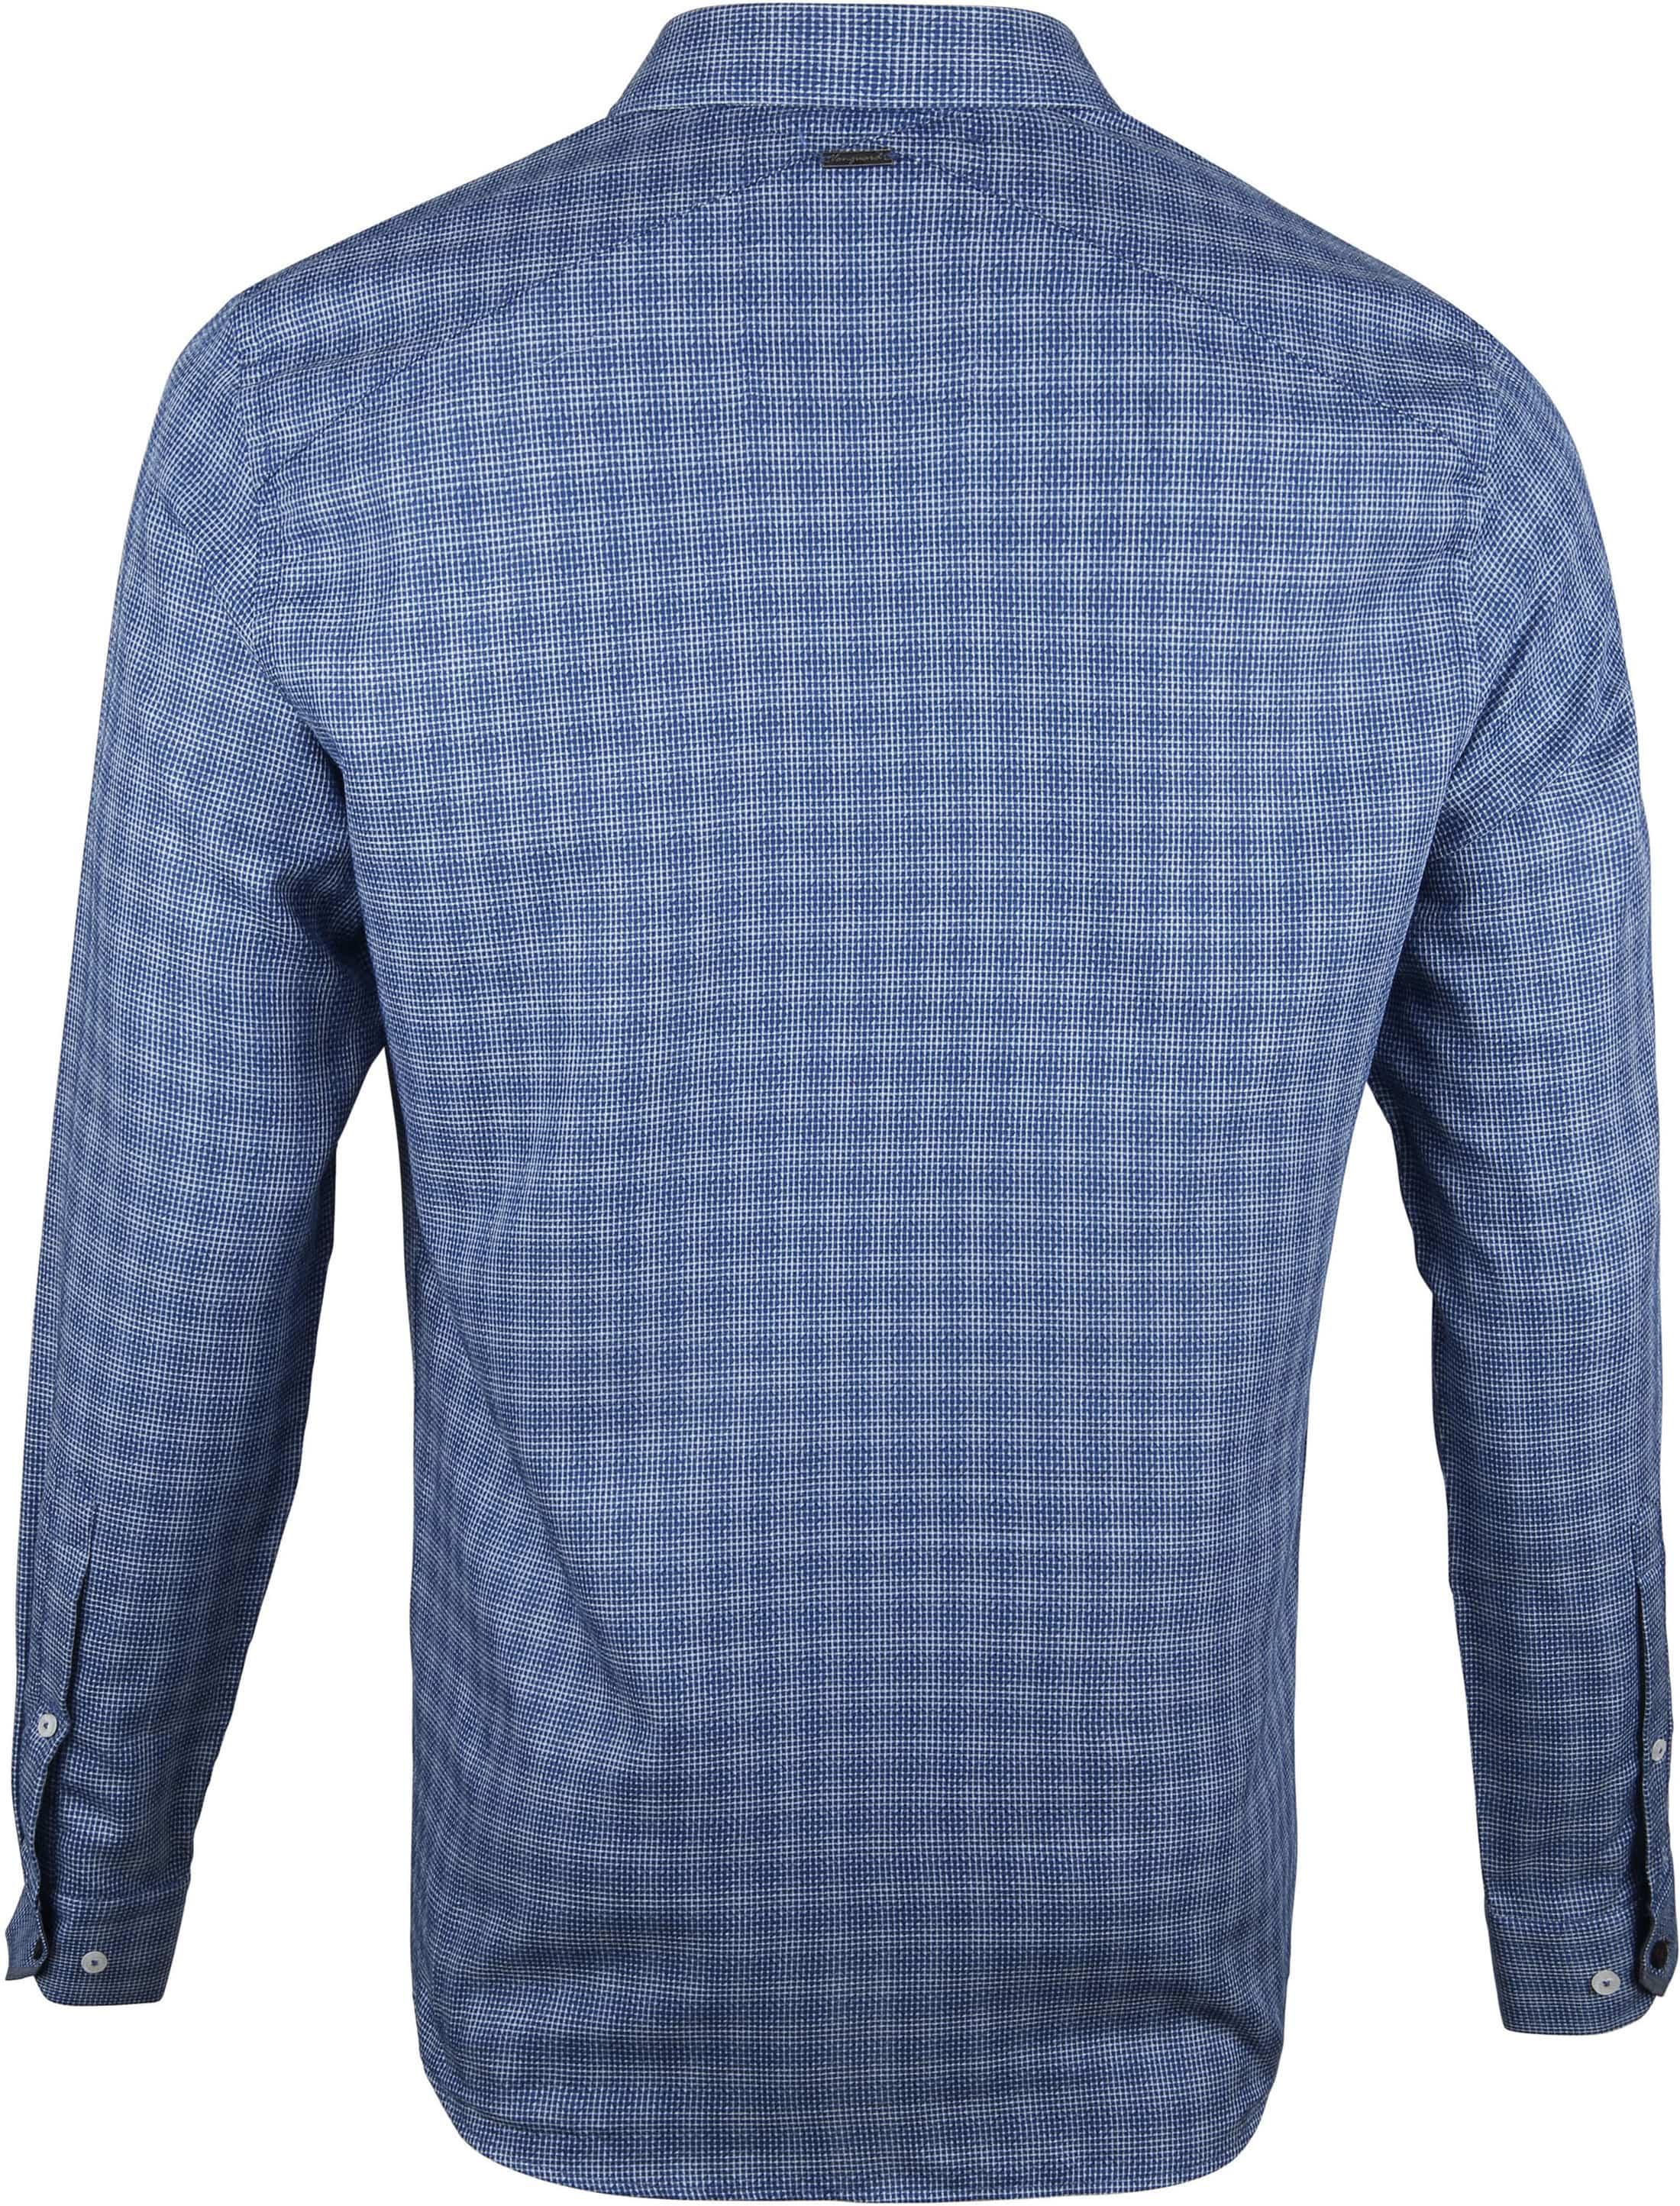 Vanguard Print Shirt Printed Navy foto 3